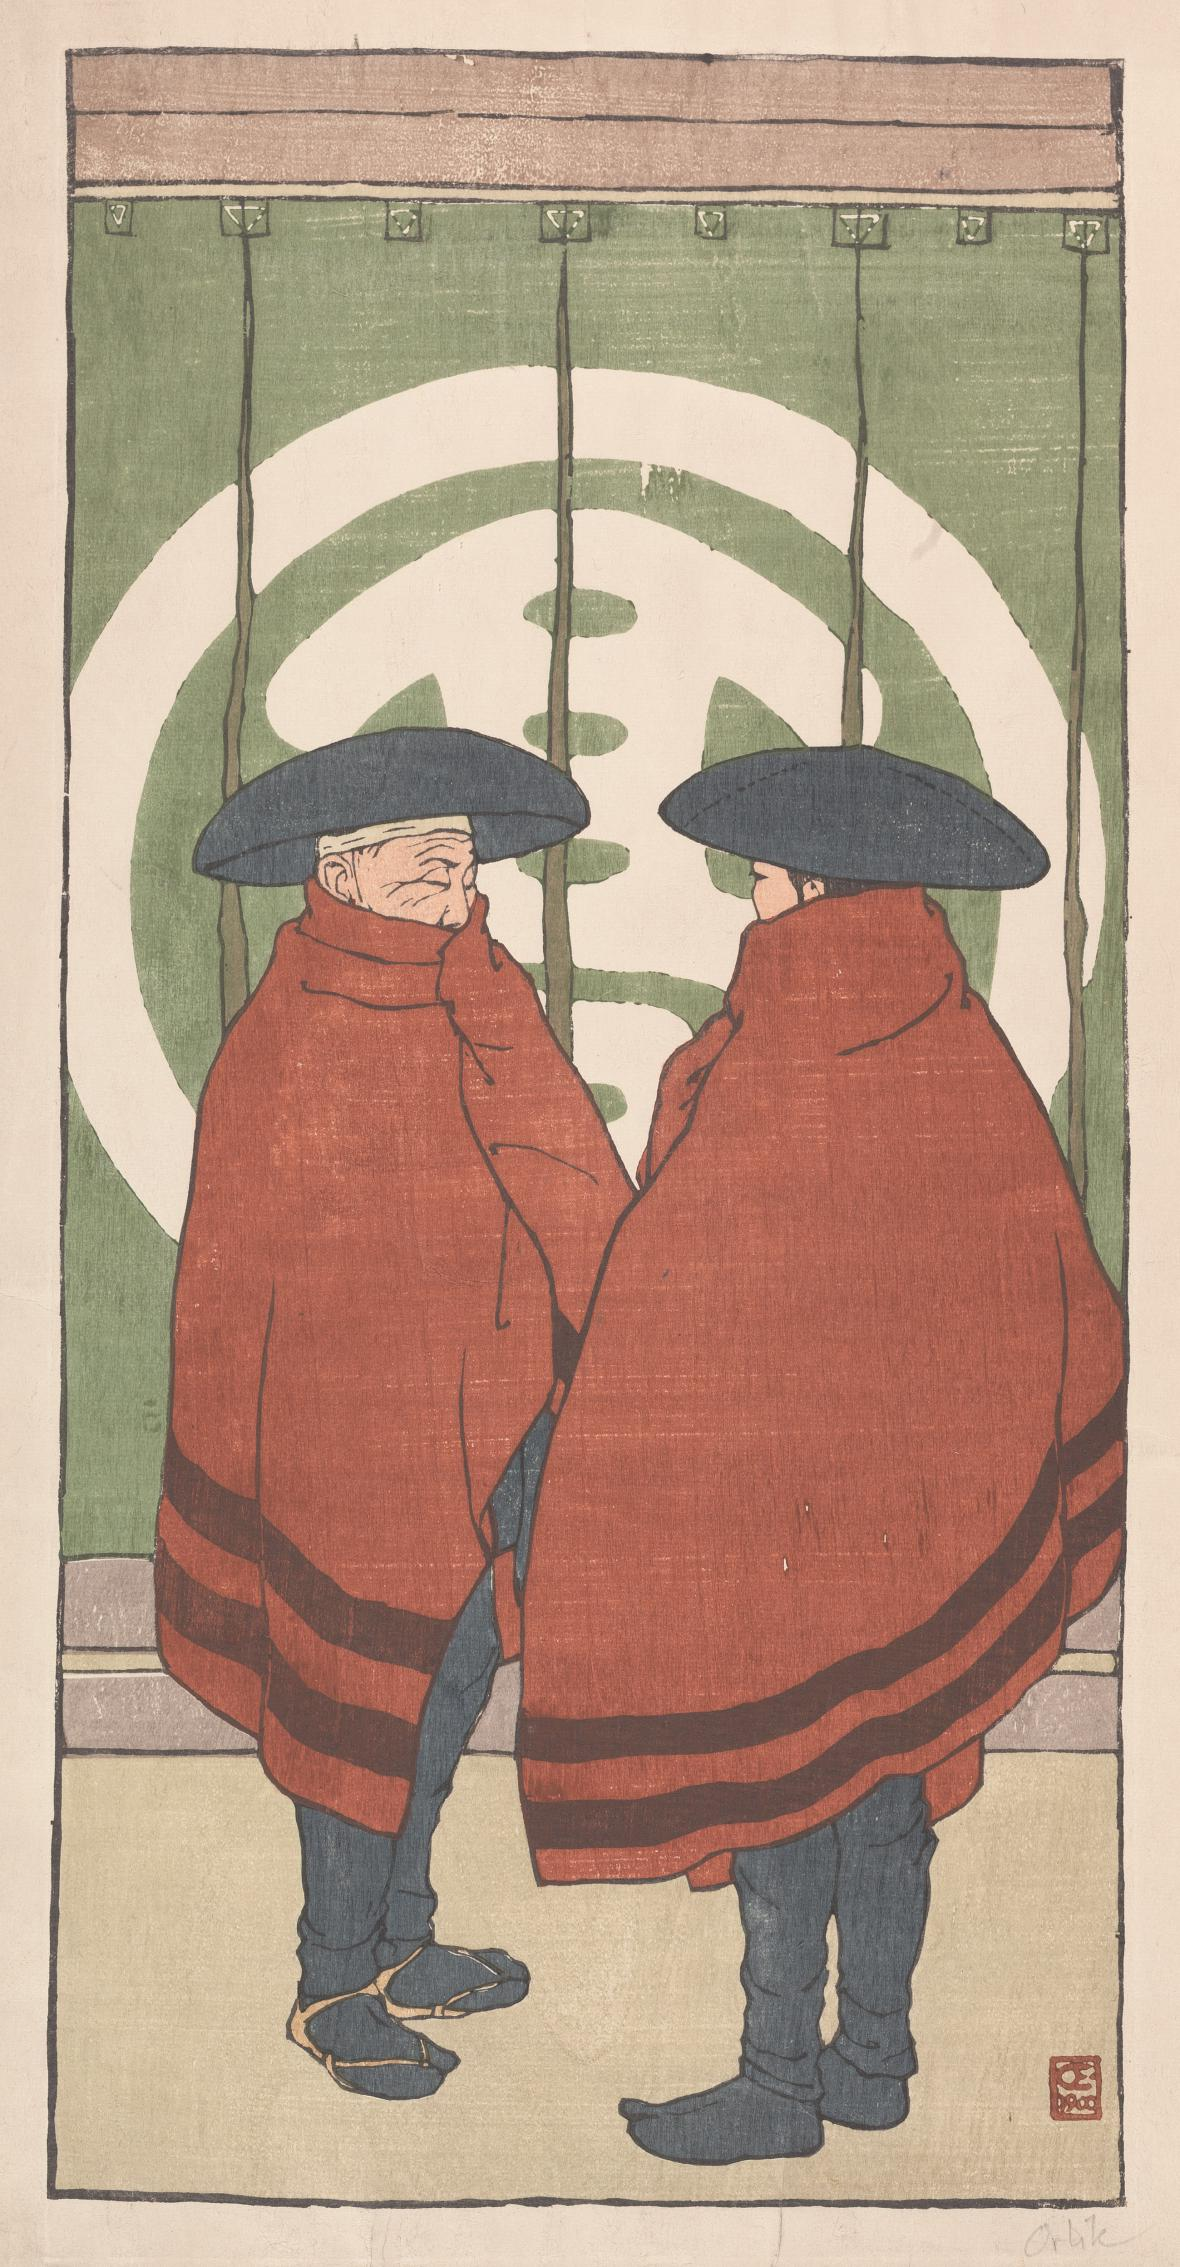 Emil Orlik / Dva Japonci, 1900